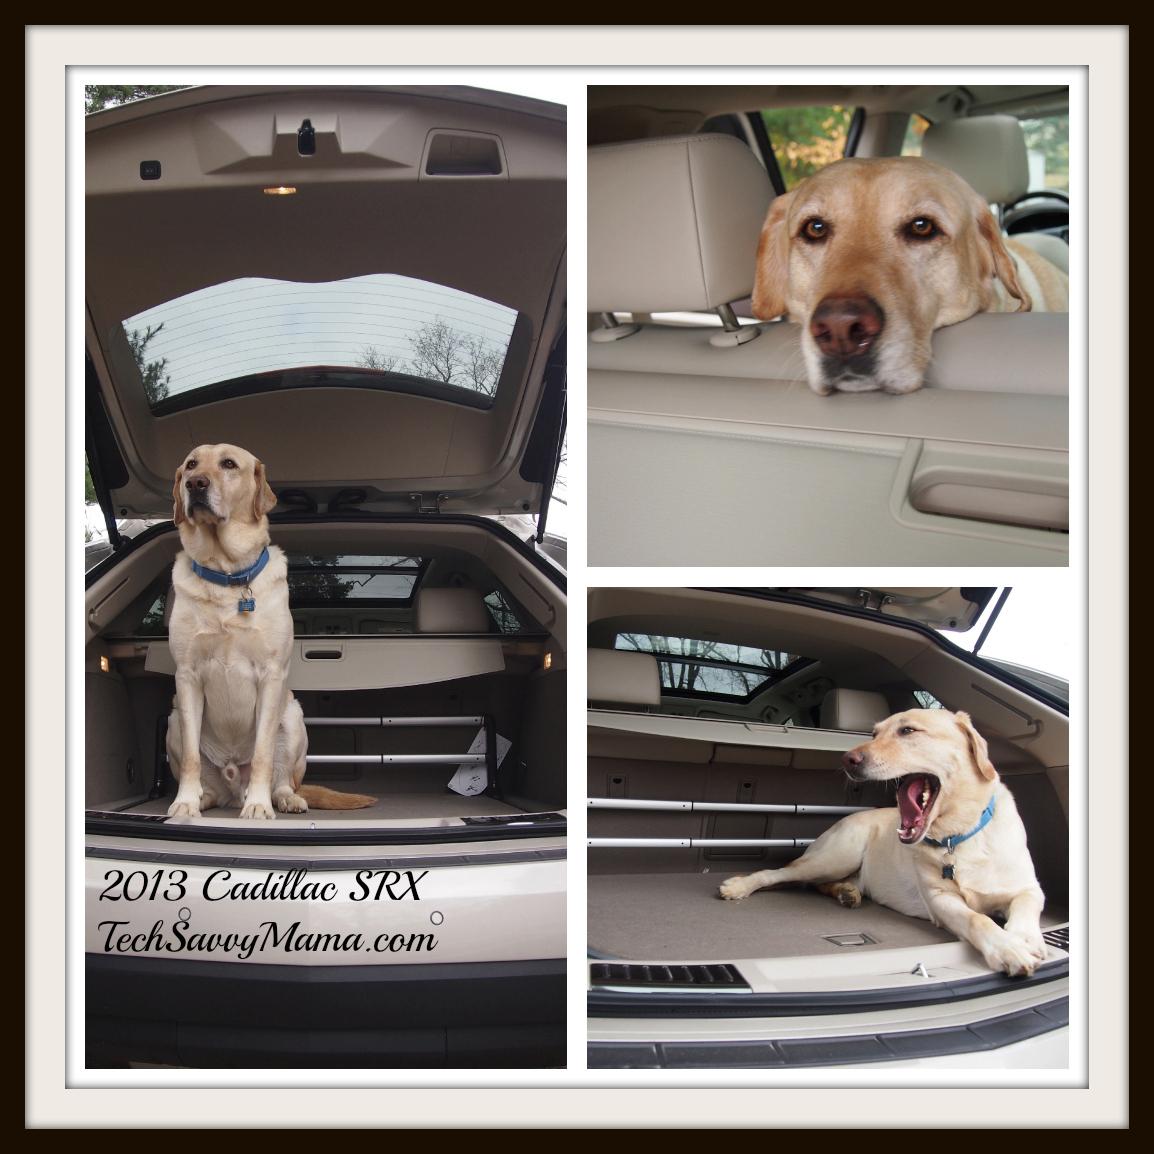 Cadillac 2013 Srx: Cadillac SRX: Luxurious Crossover SUV With An Eye For